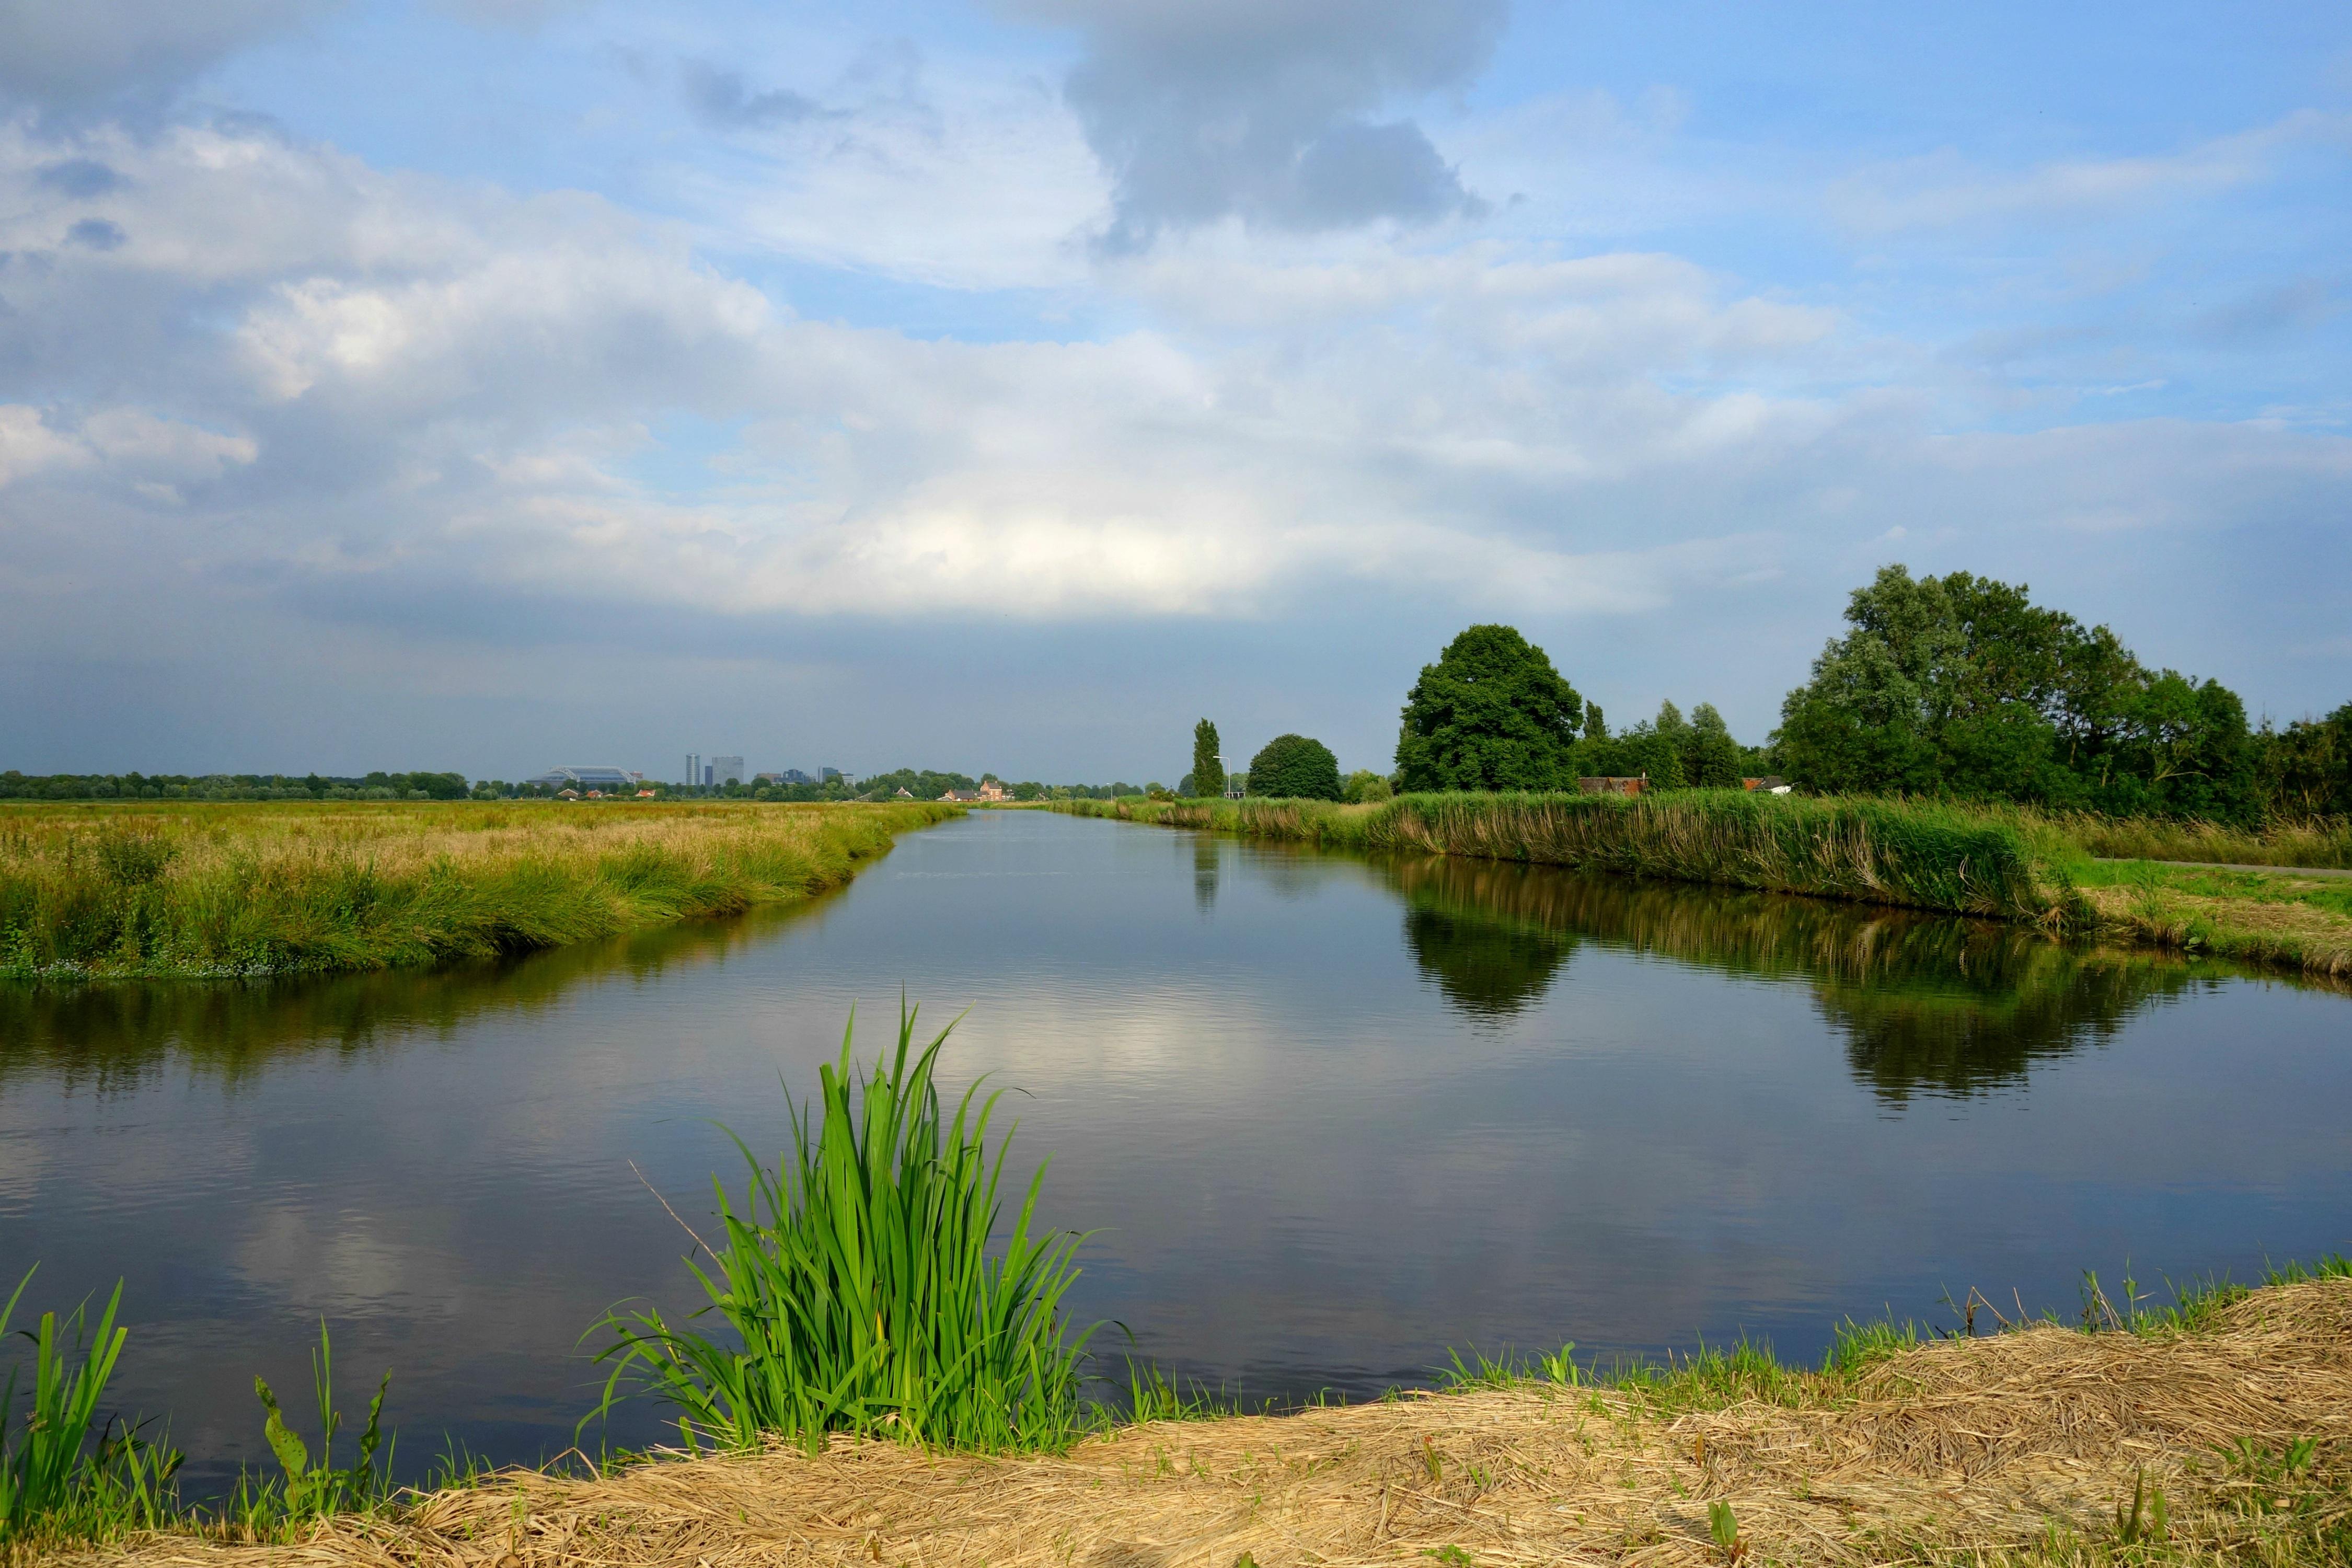 Деревенское озеро картинки